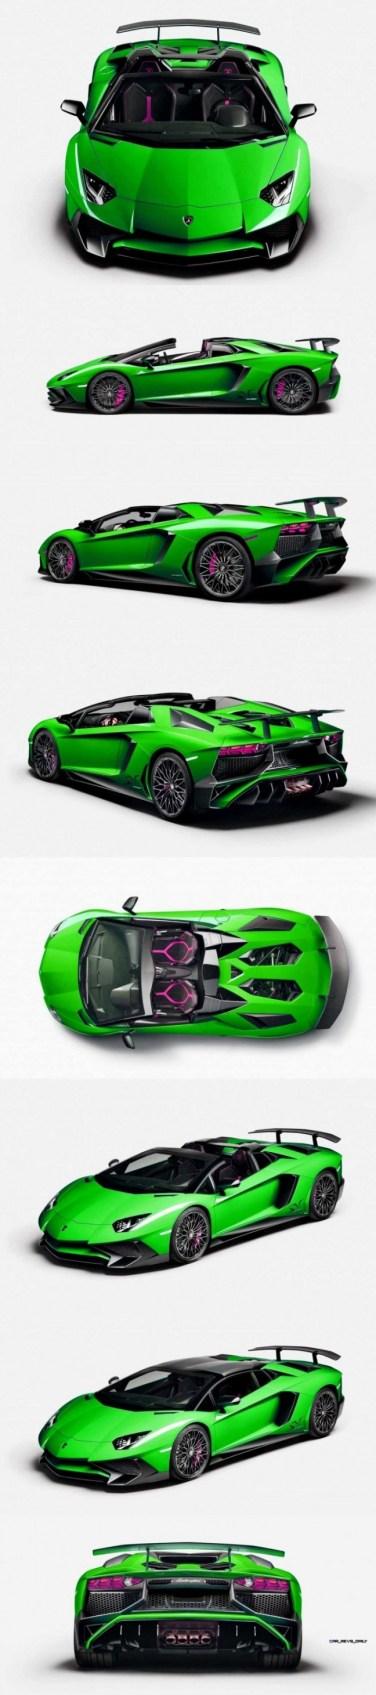 2016-Lamborghini-Aventador-LP-750-4-Supervelgsfrdoce-Roadster-11